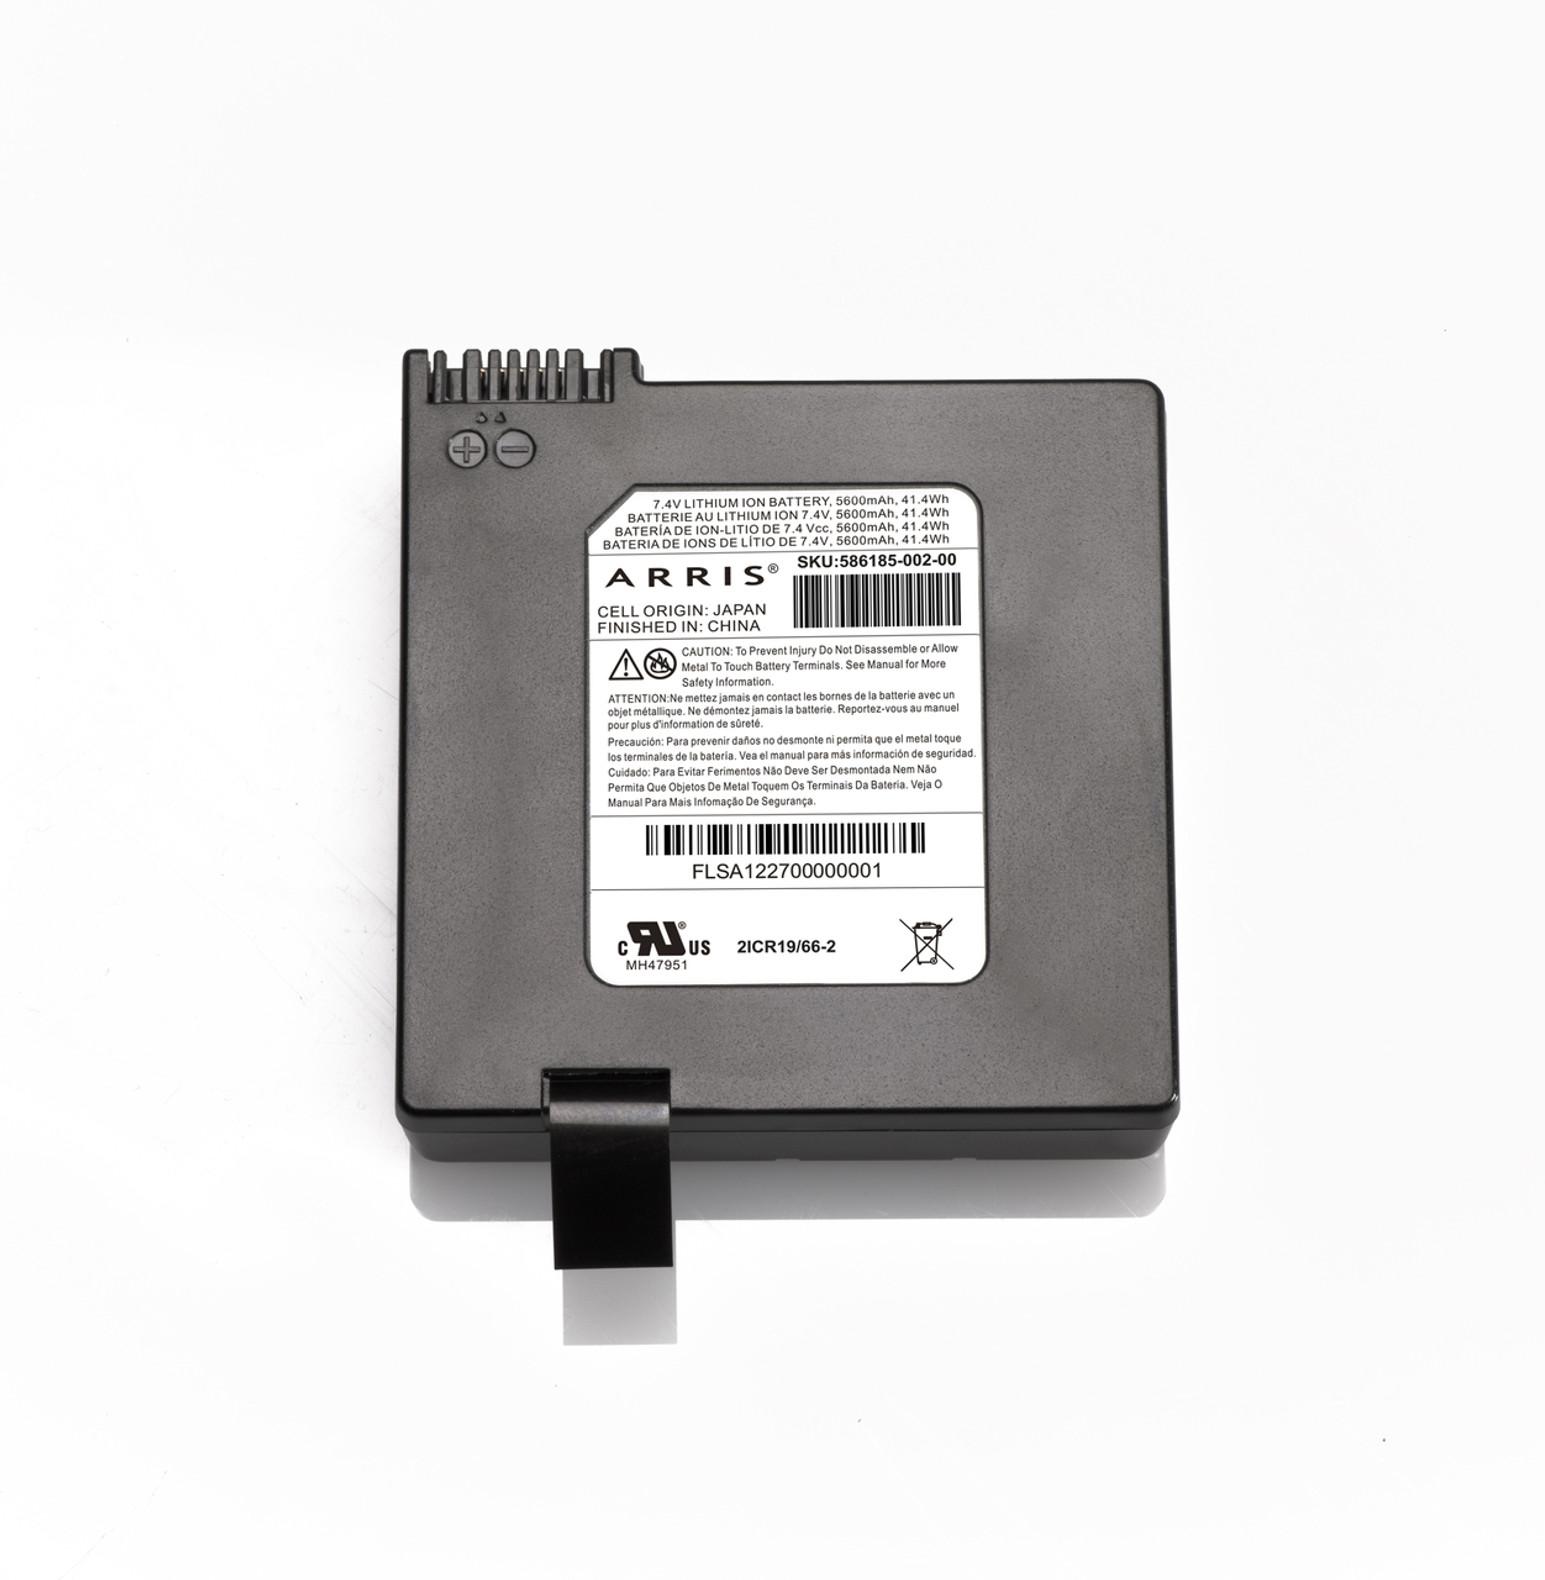 At T Nvg589 Nvg599 U Verse Gateway Replacement Battery Sku 586185 002 00 Surfboard Store